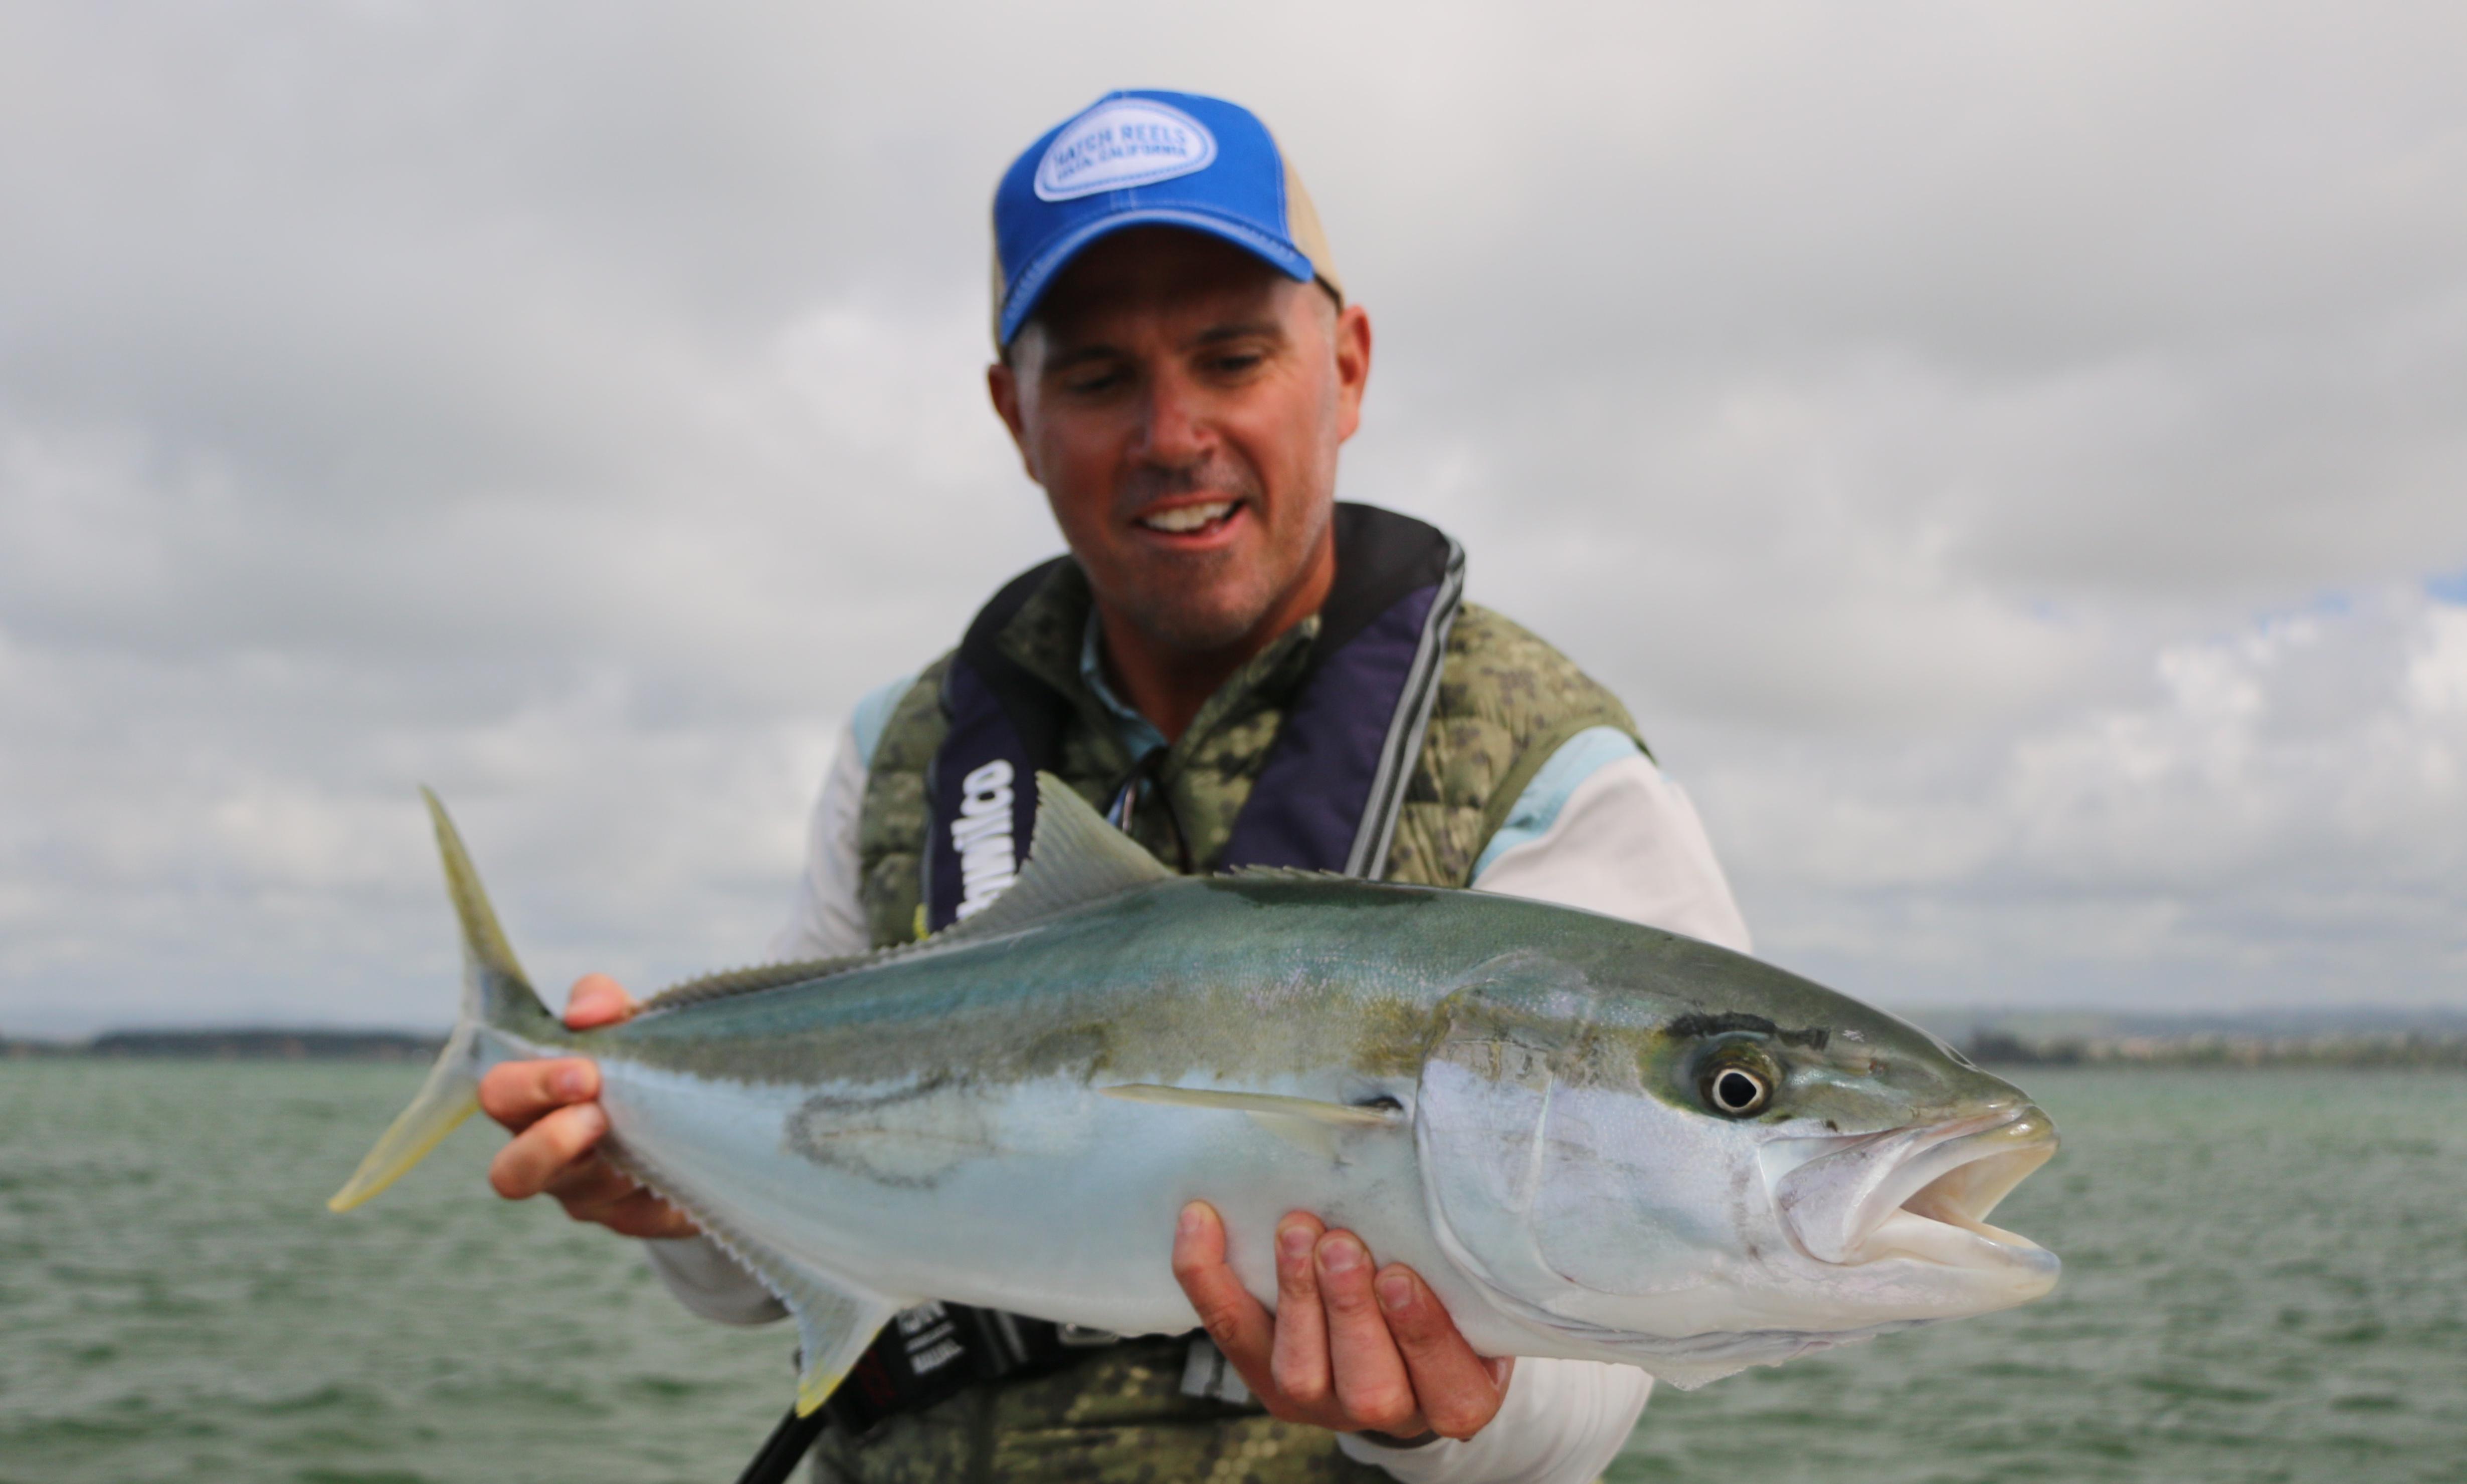 Tauranga, flats, kingfish, fly rod, salt water, fishing, yellowtail